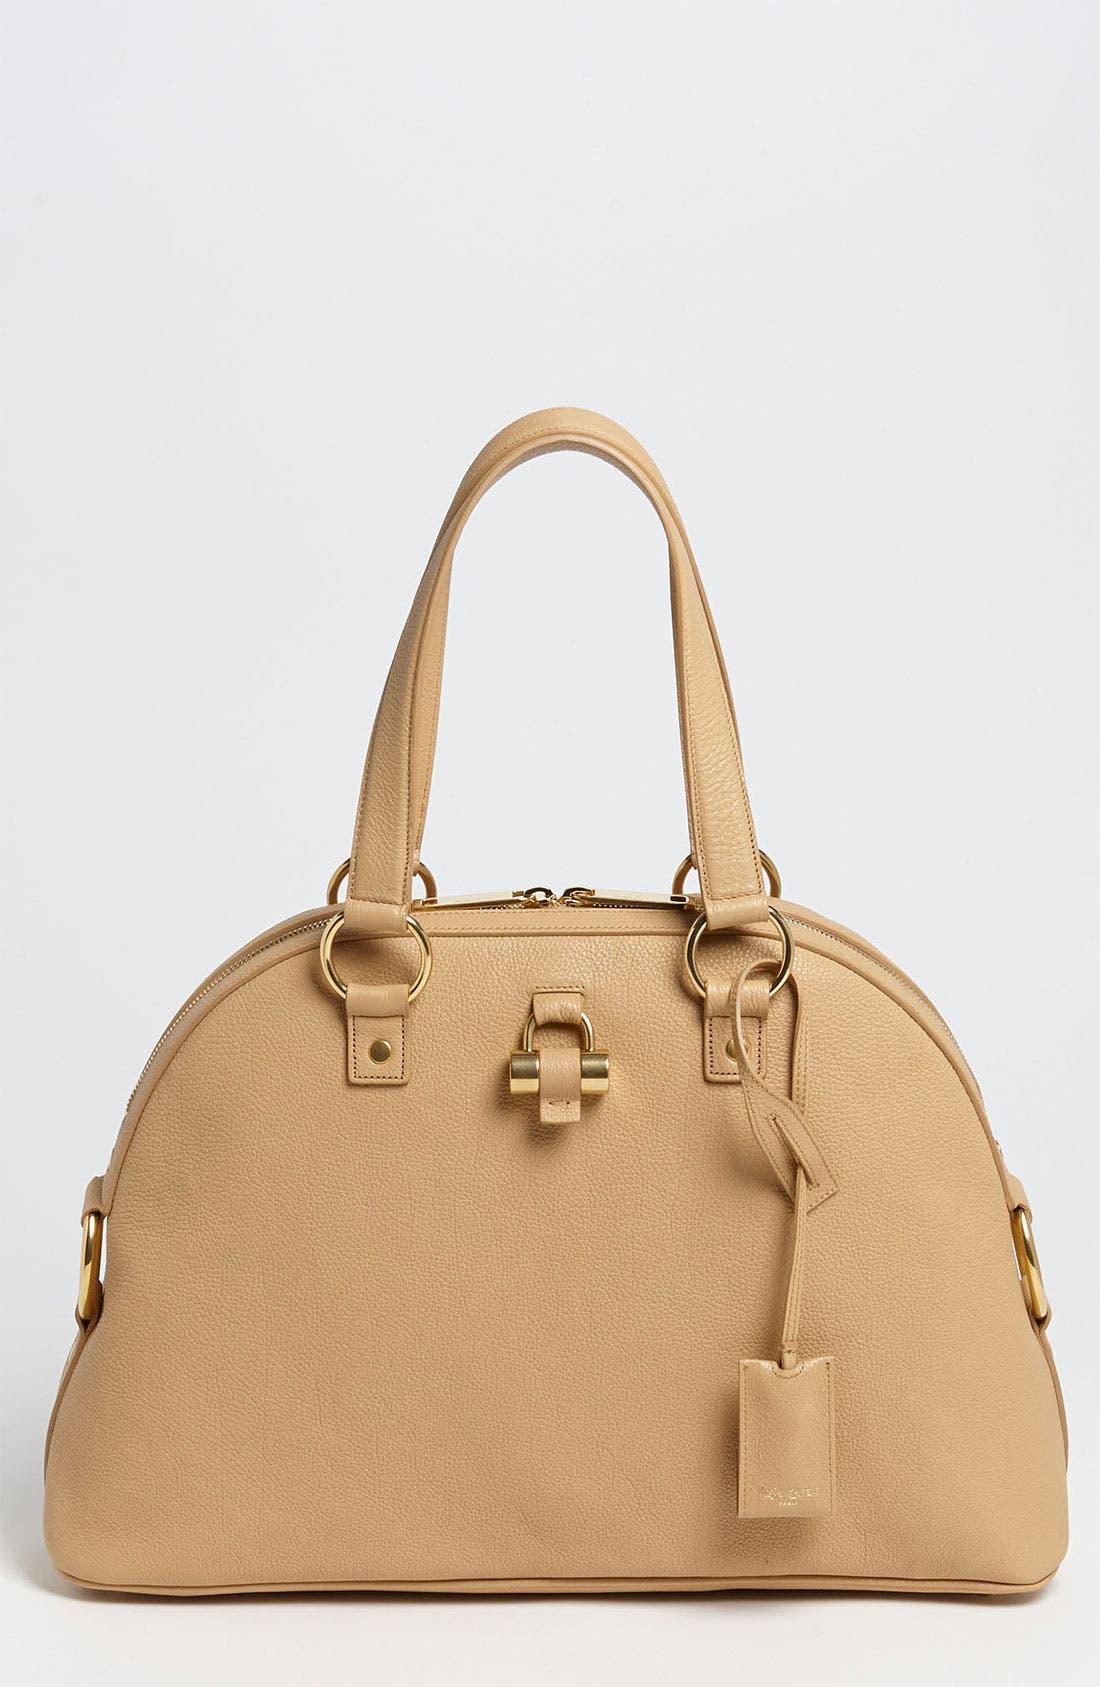 Main Image - Saint Laurent 'Muse - Medium' Leather Dome Satchel